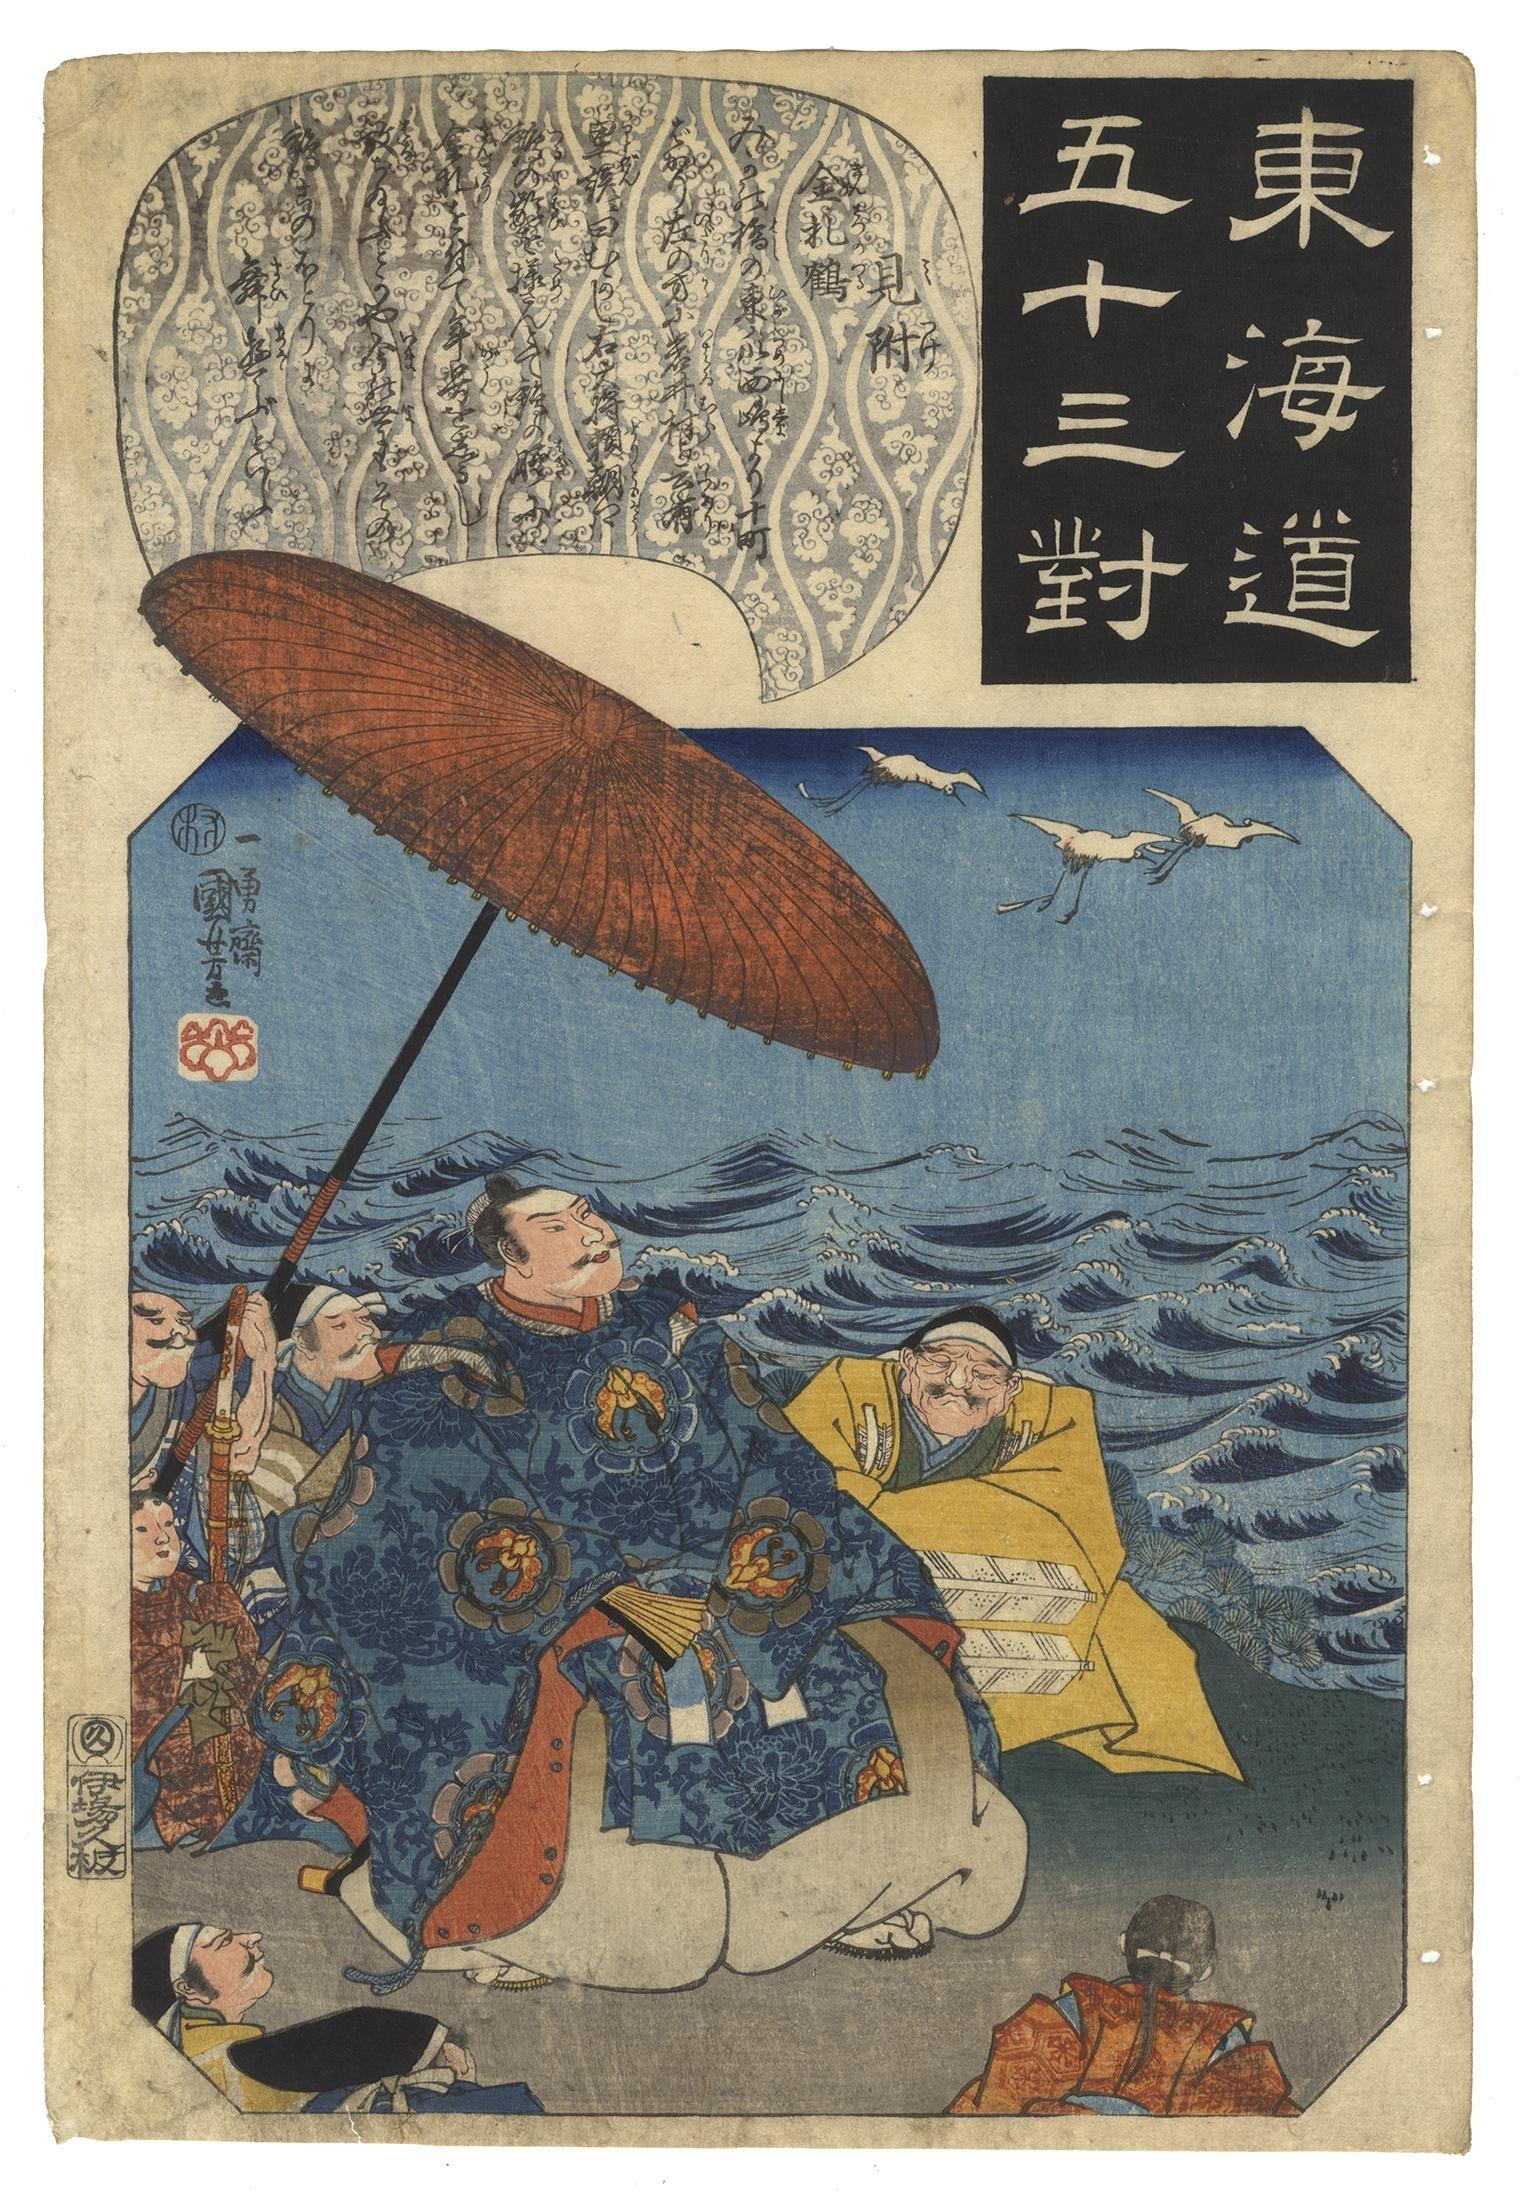 Kuniyoshi Utagawa, Stations, Ocean, Japanese woodblock